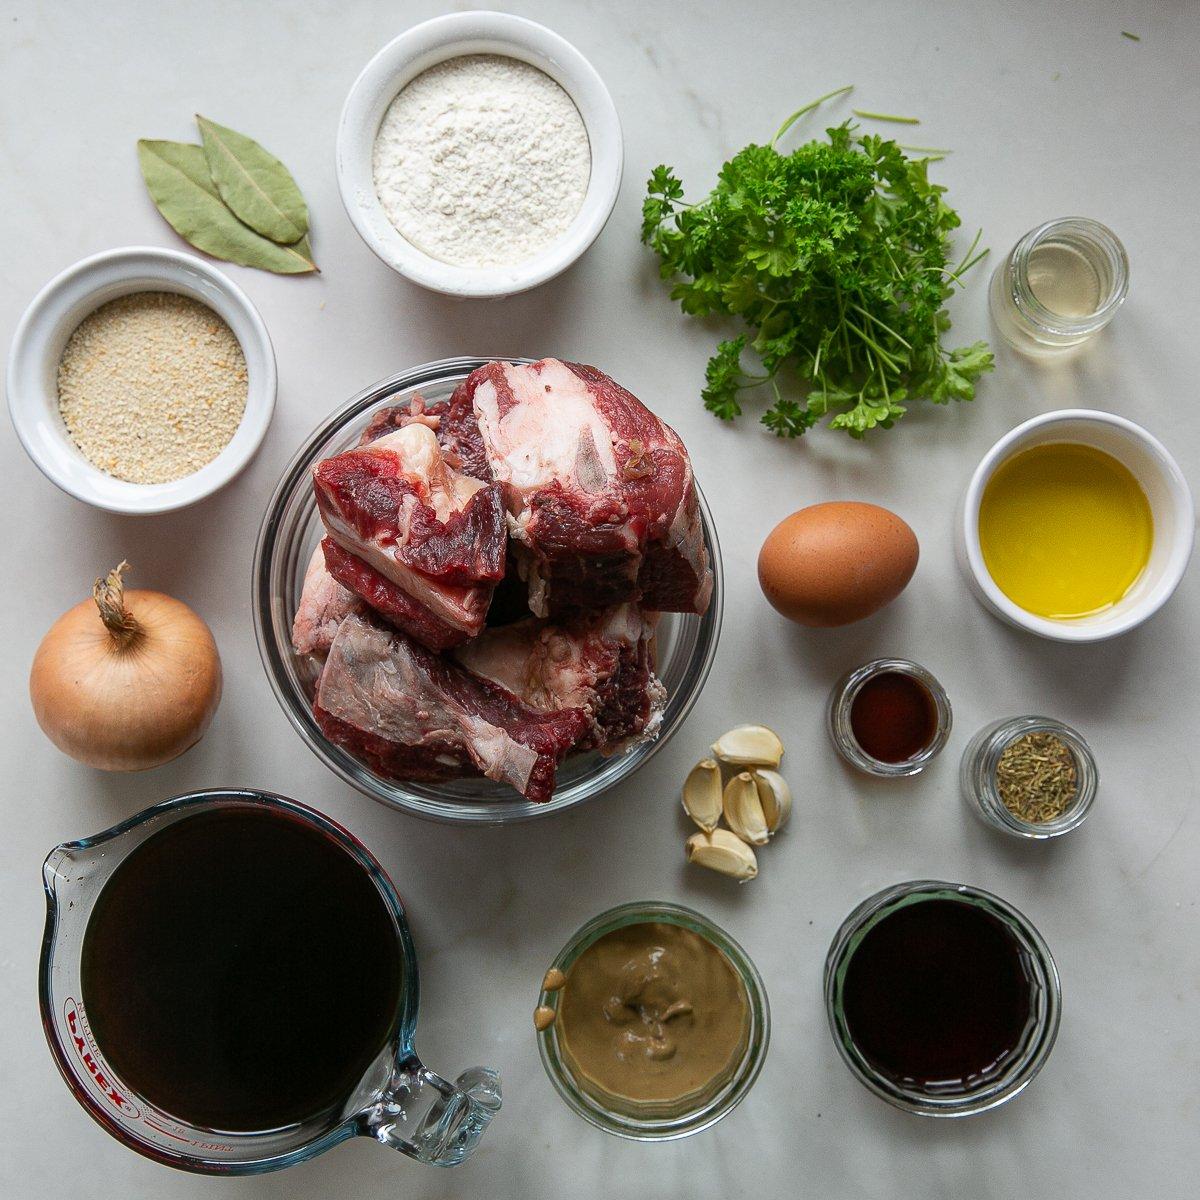 All the ingredients needed to make beef short rib ravioli